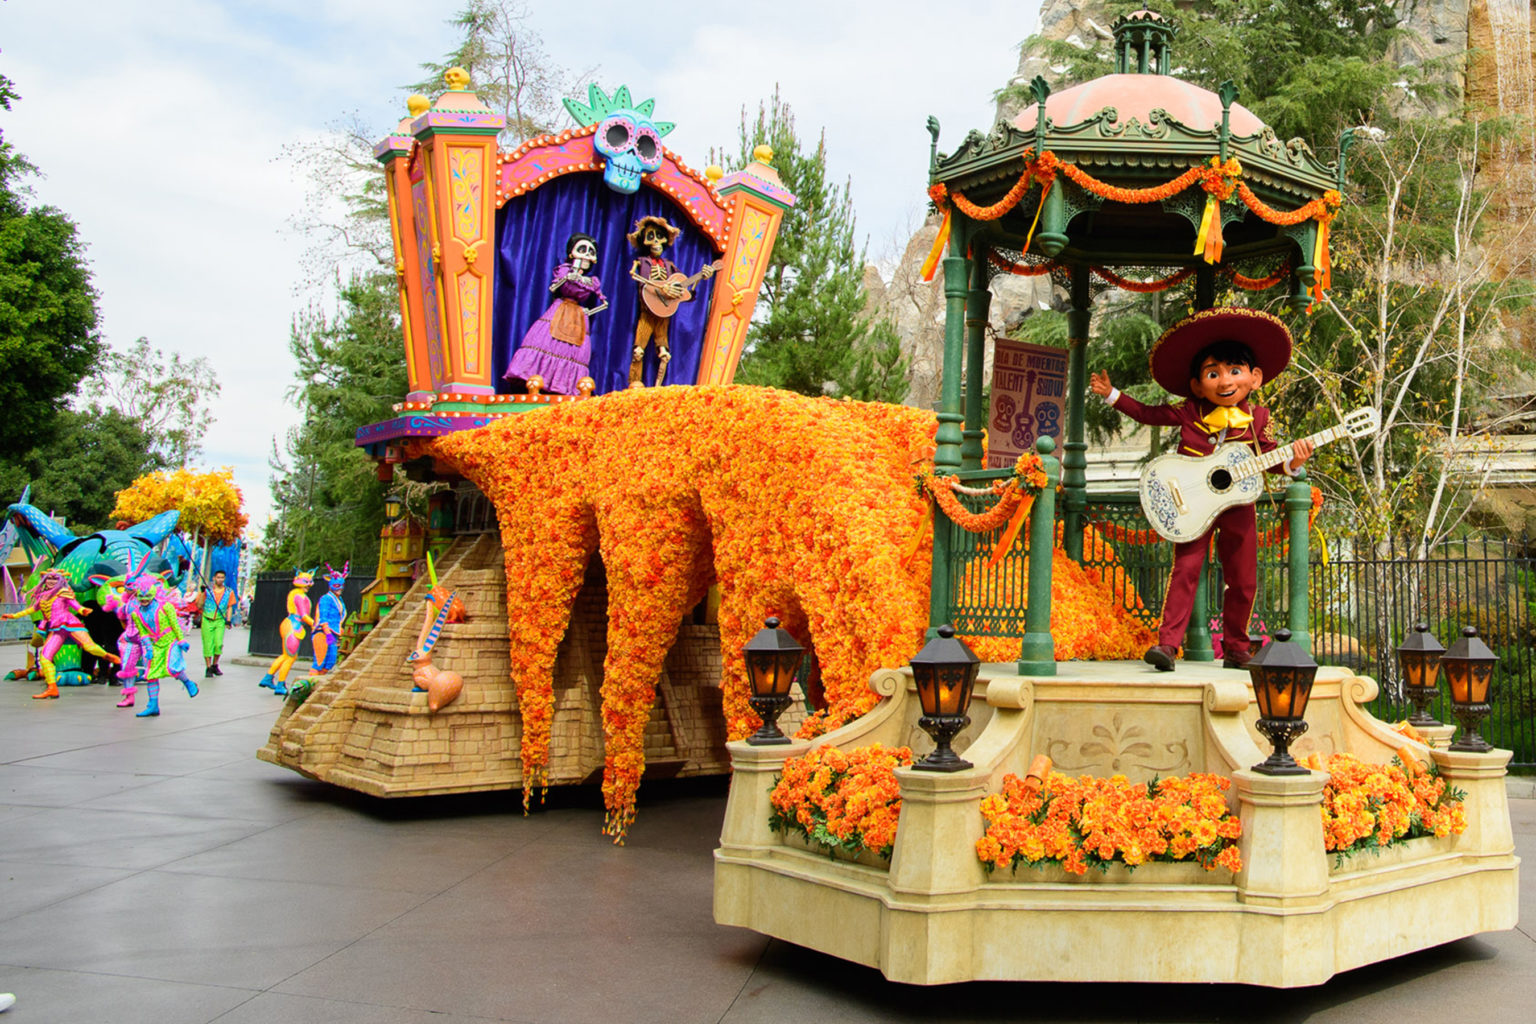 'Coco' float in the 'Magic Happens' Parade at Disneyland Park